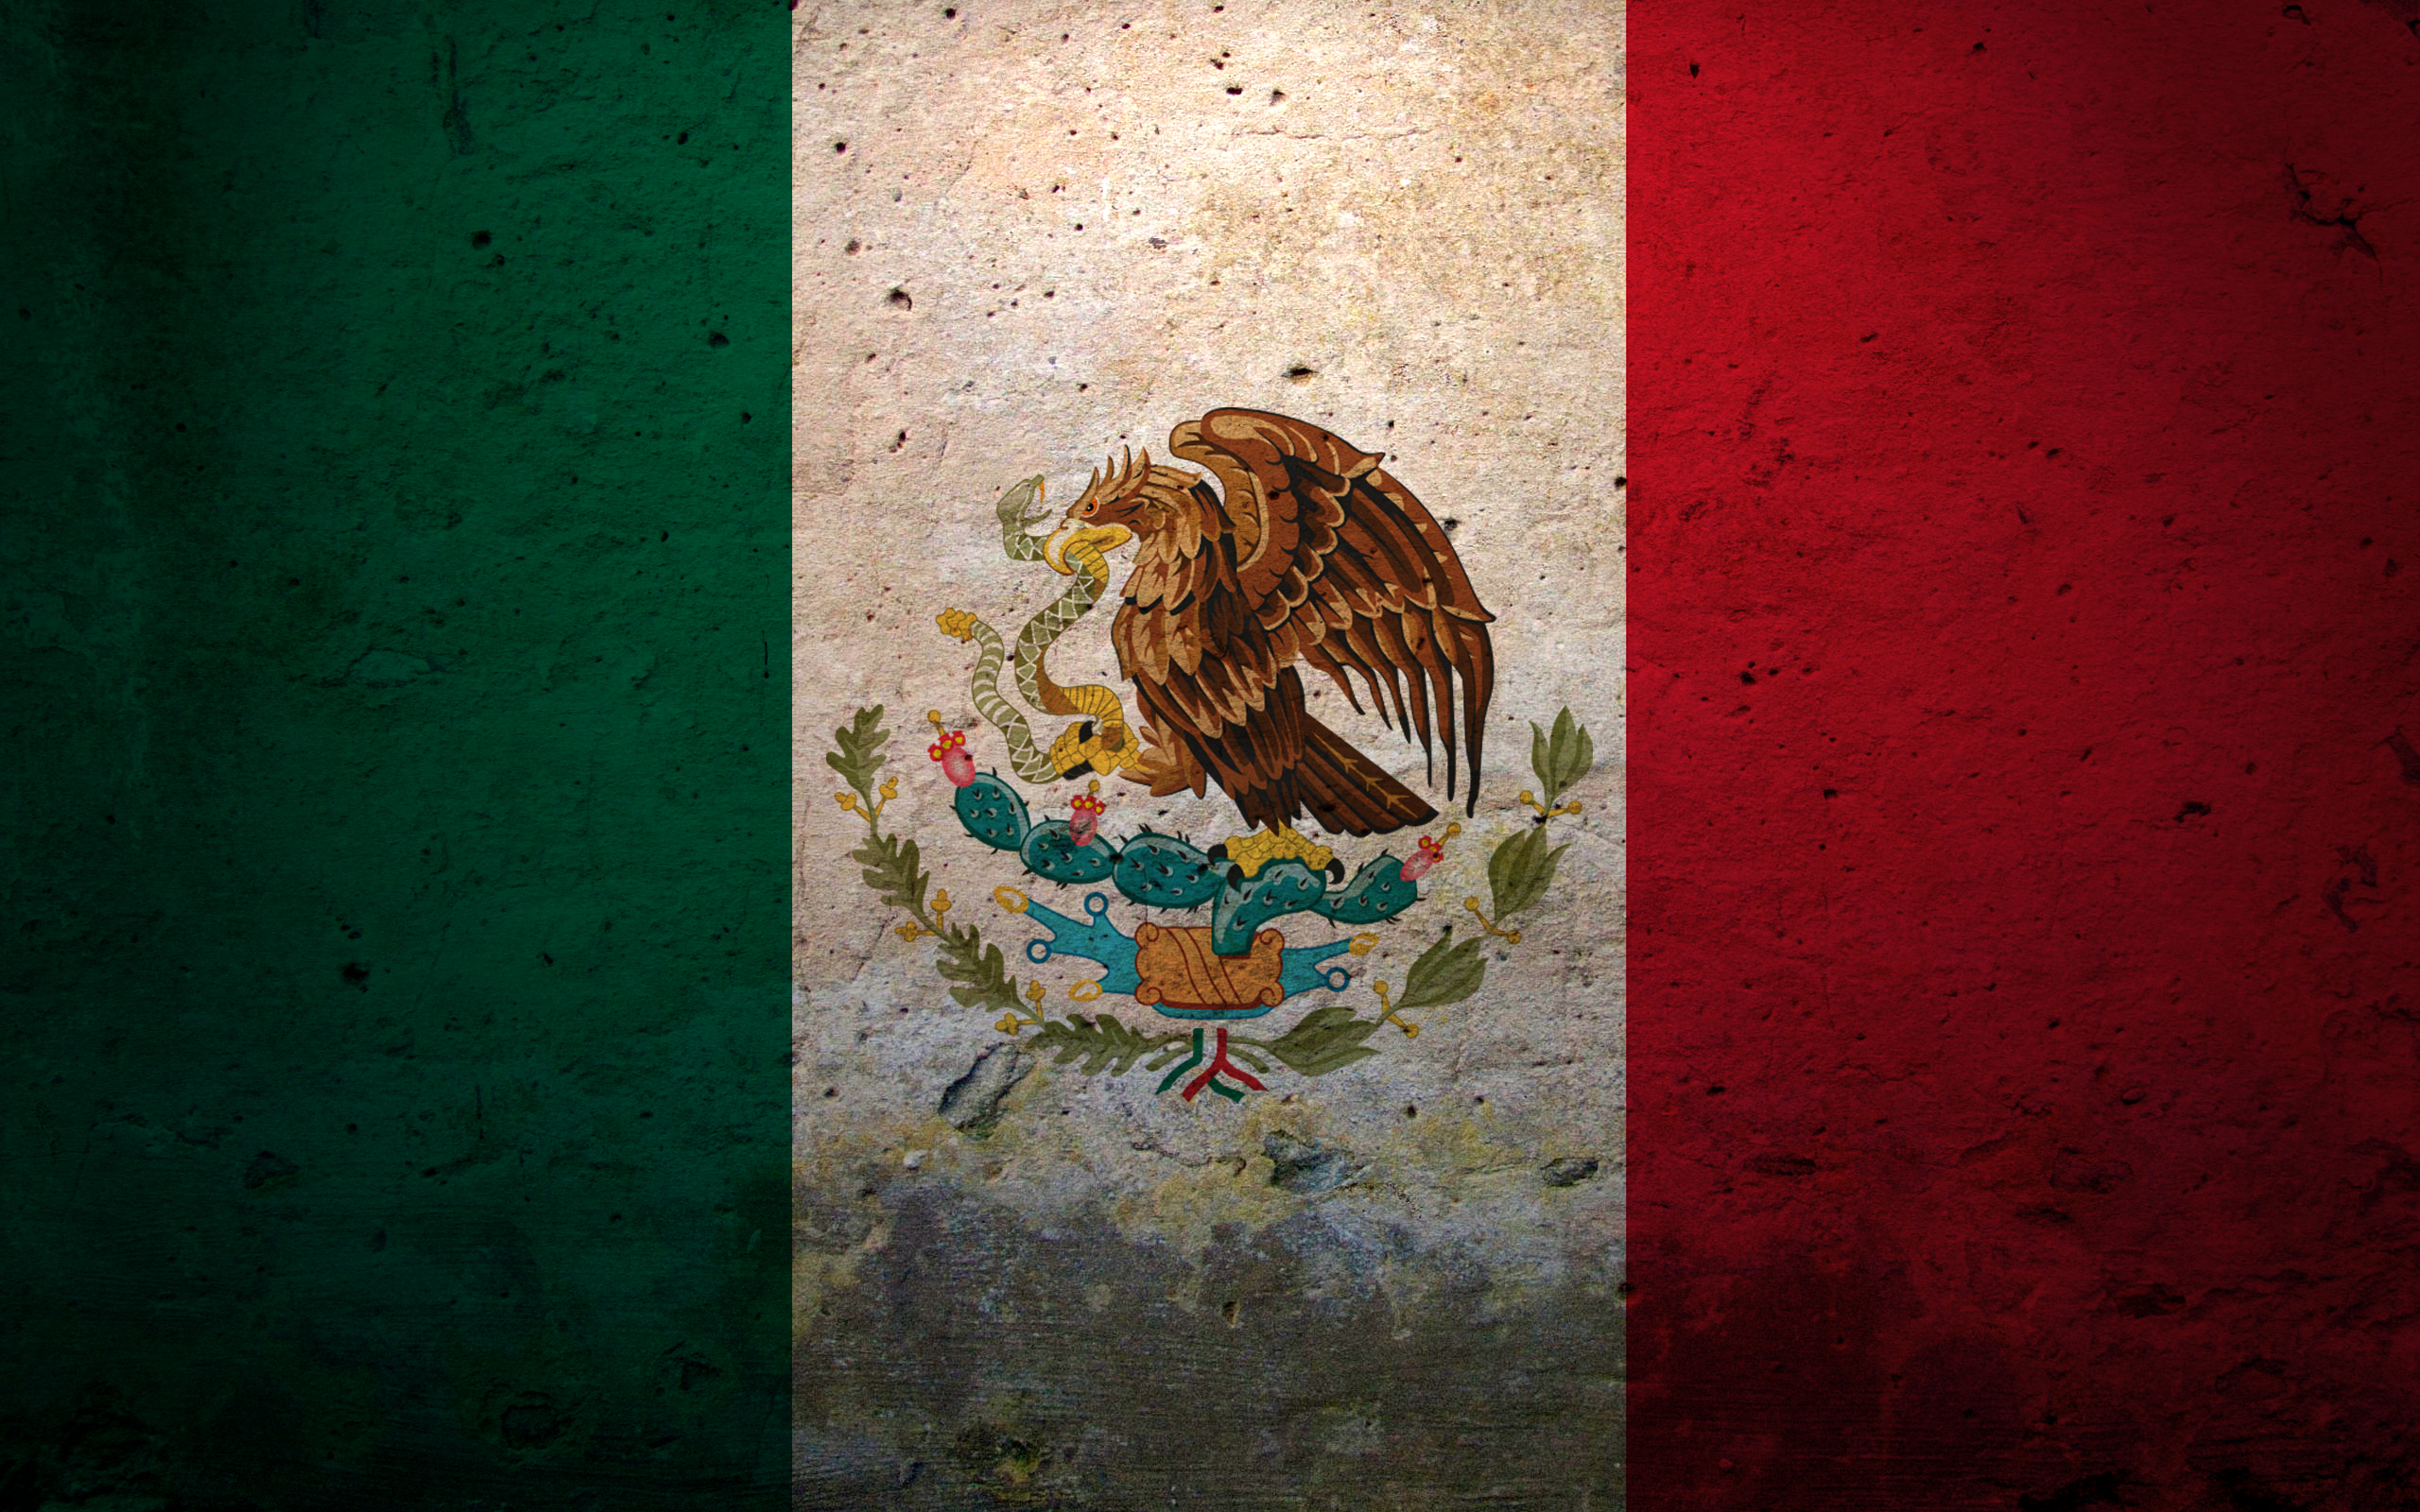 Cinco de mayo mexican flag coloring page - Flags Mexico Wallpaper 2560x1600 Flags Mexico